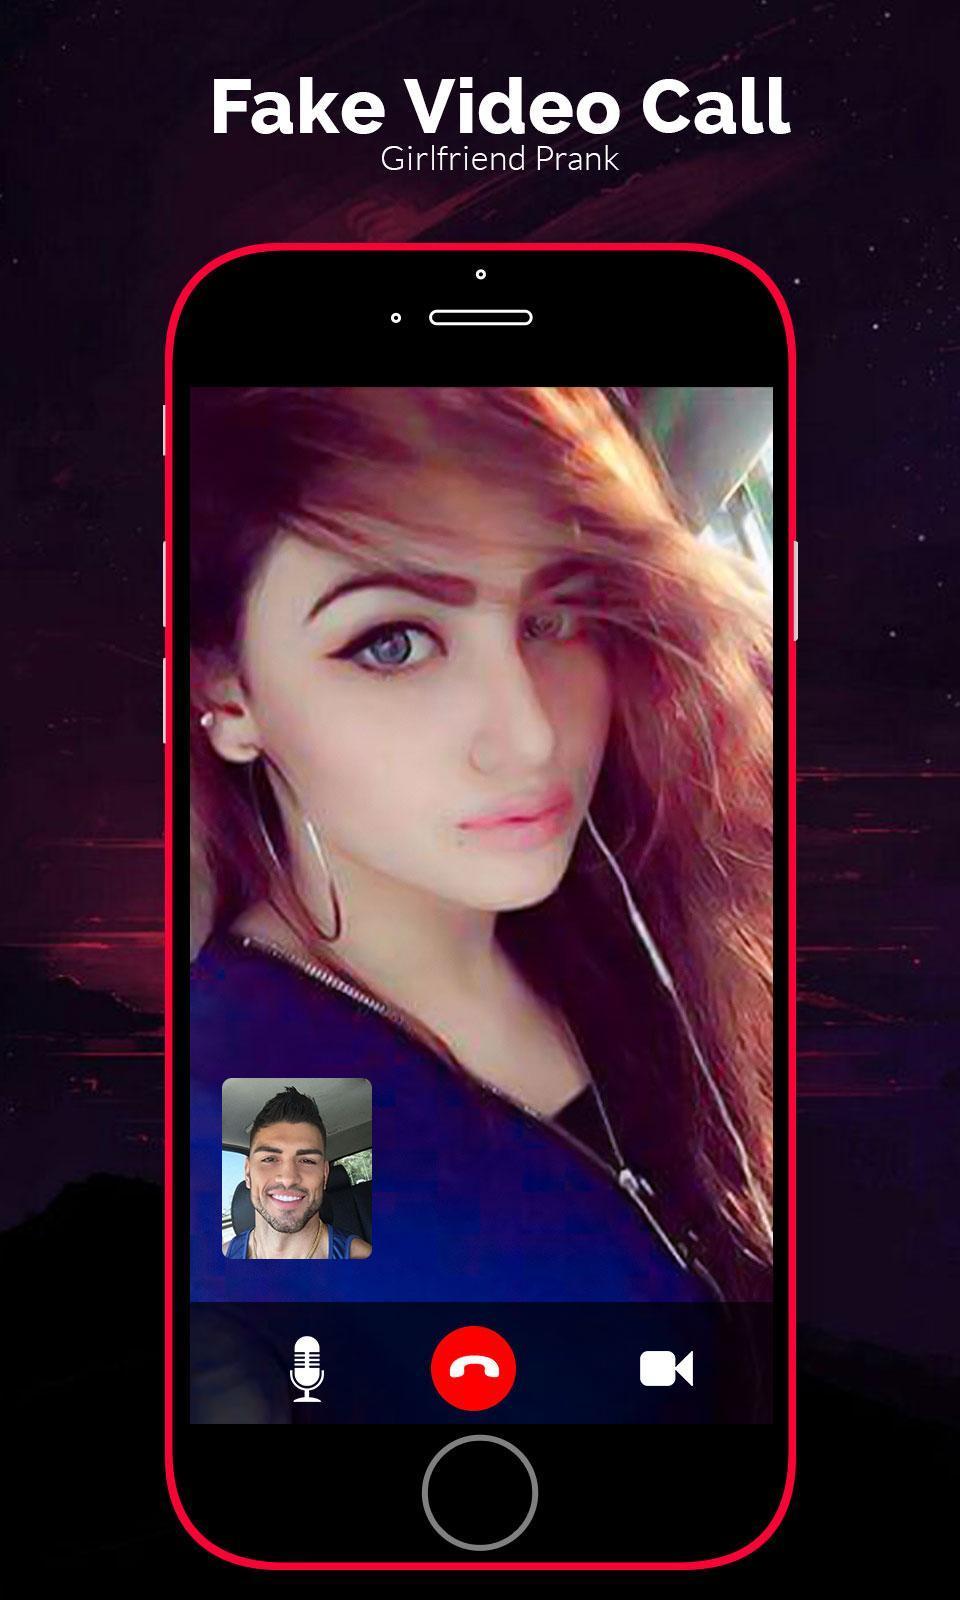 Fake video call - Girlfriend Video Call Prank poster